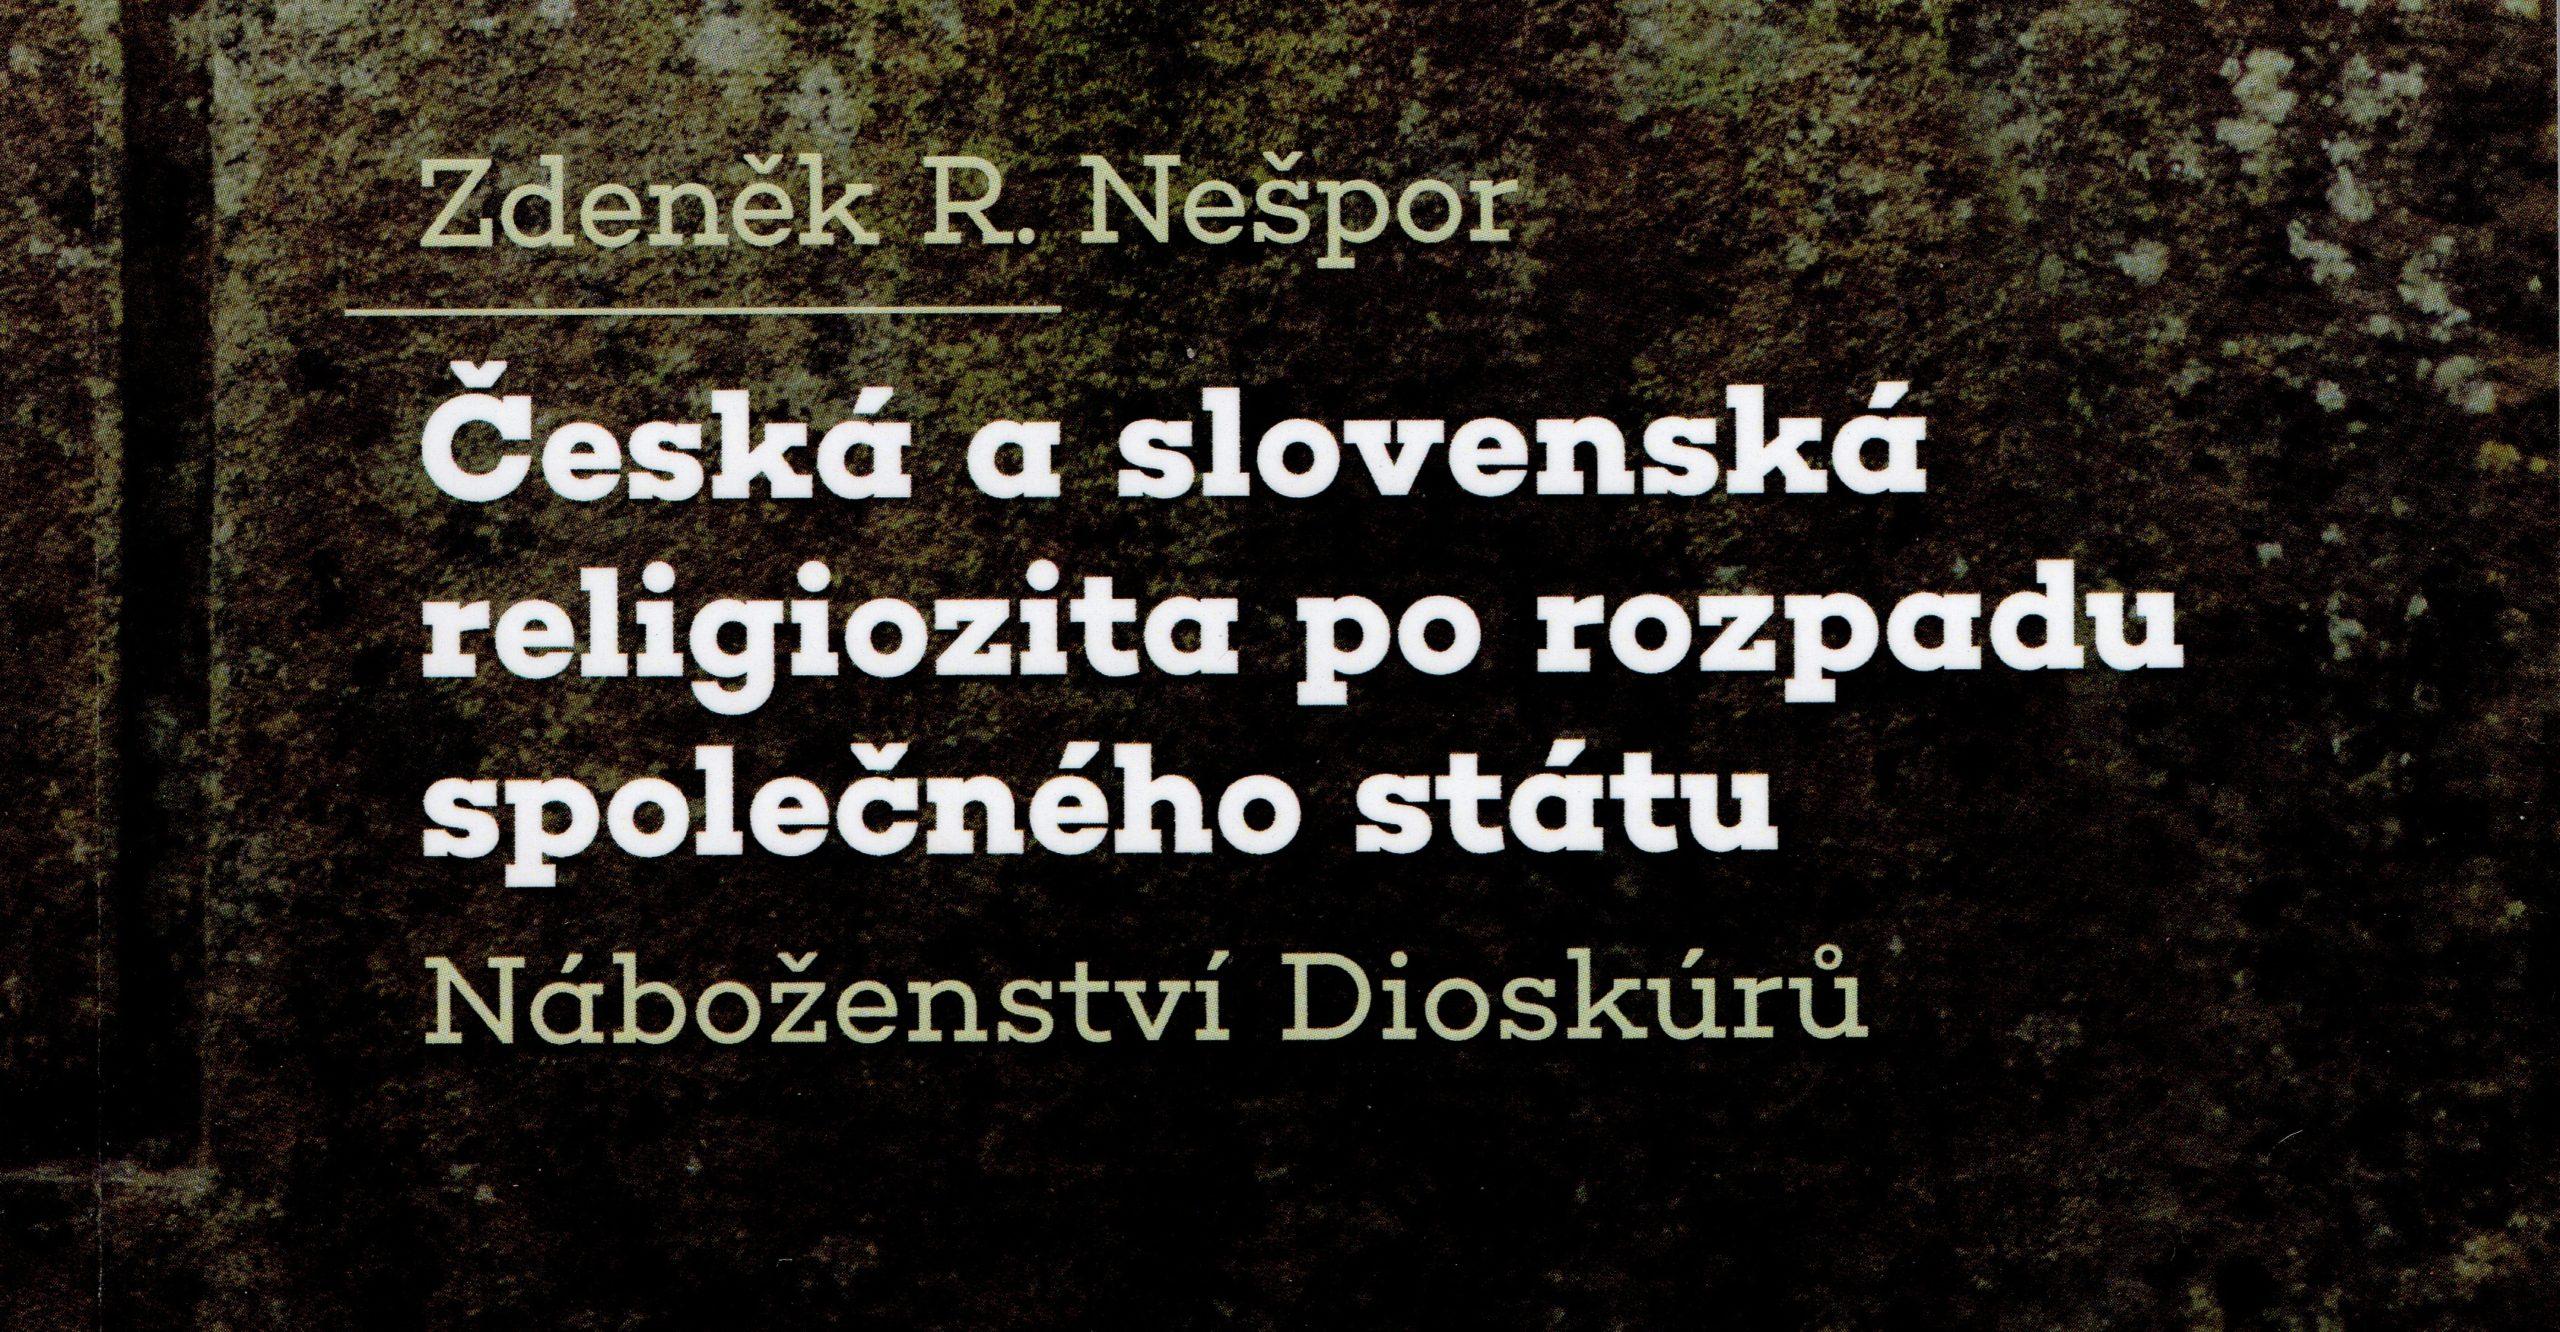 Anatomie rozdílu mezi českou aslovenskou religiozitou